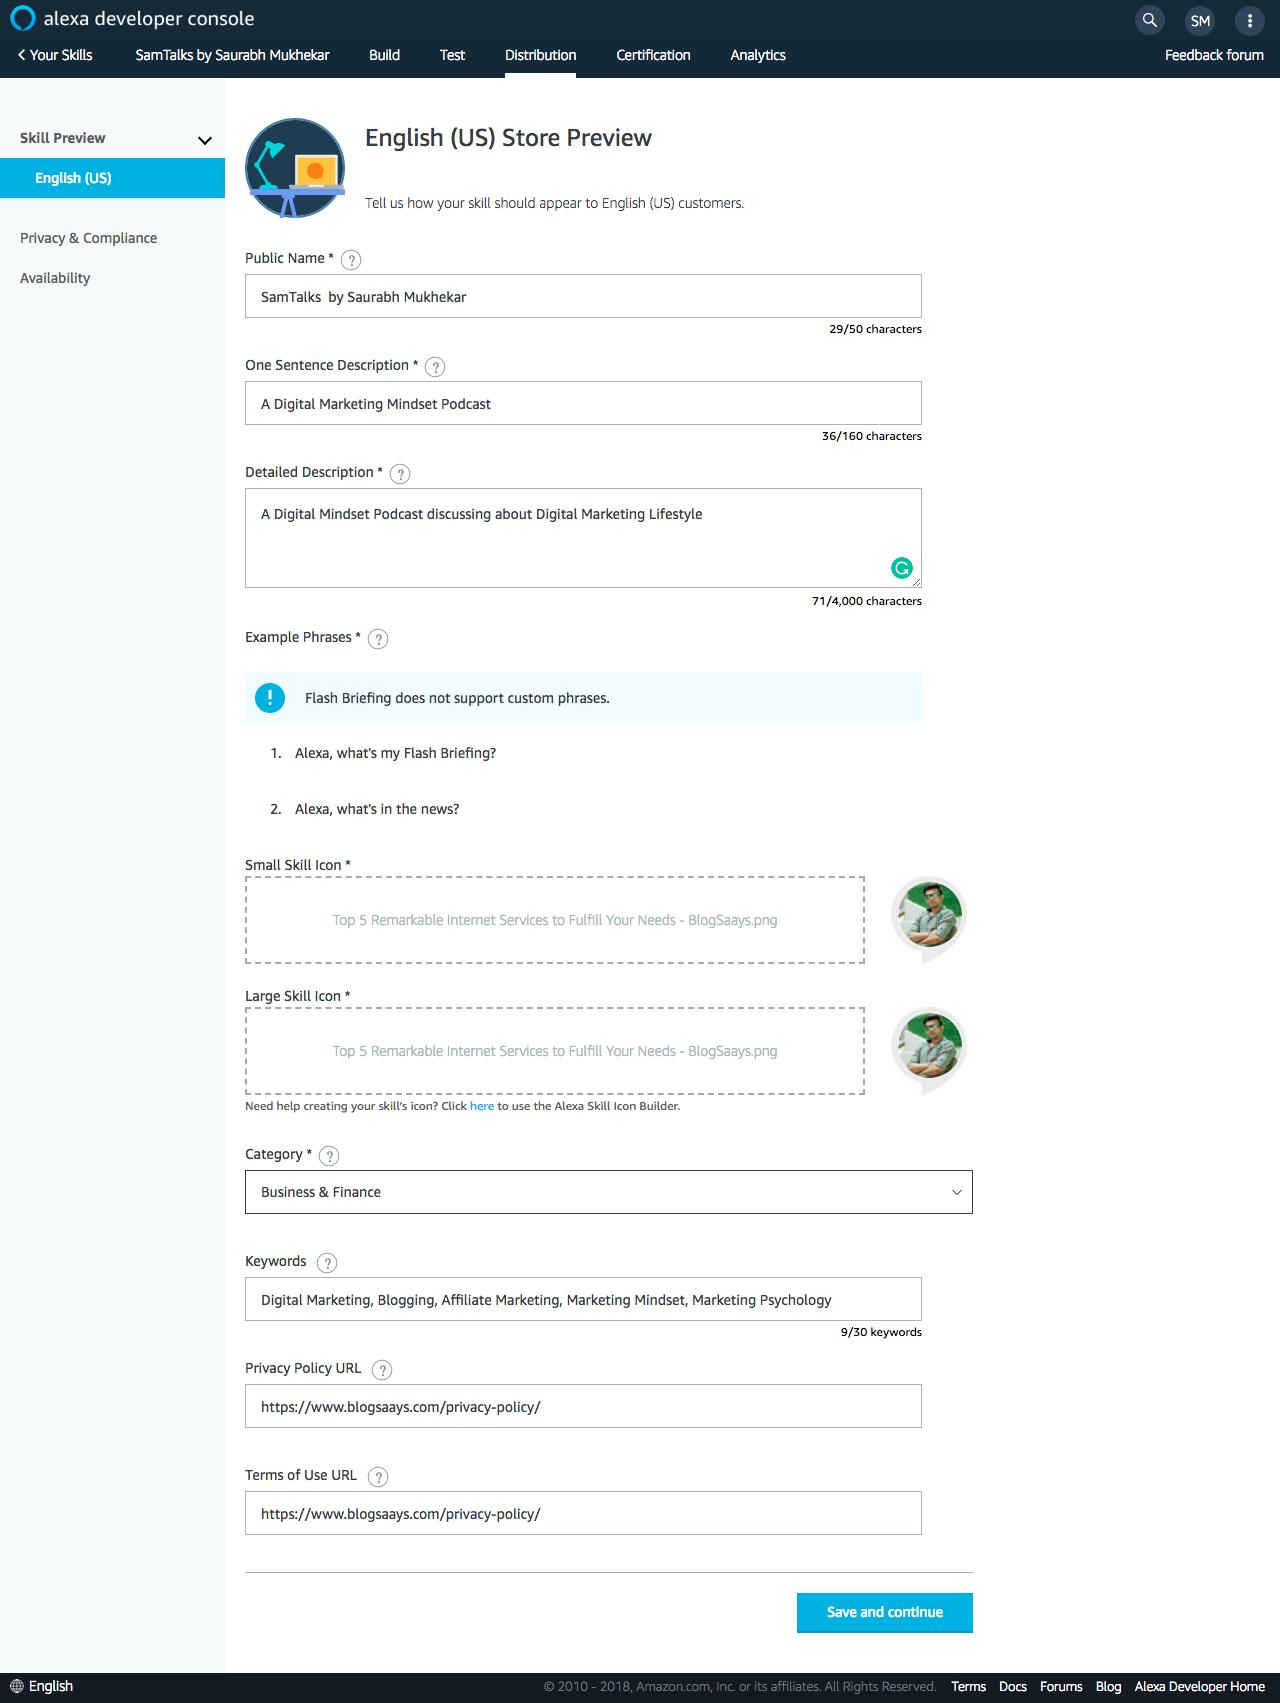 developer-amazon-alexa-console-ask-publish-alexapublishing-amzn1-ask-skill-8